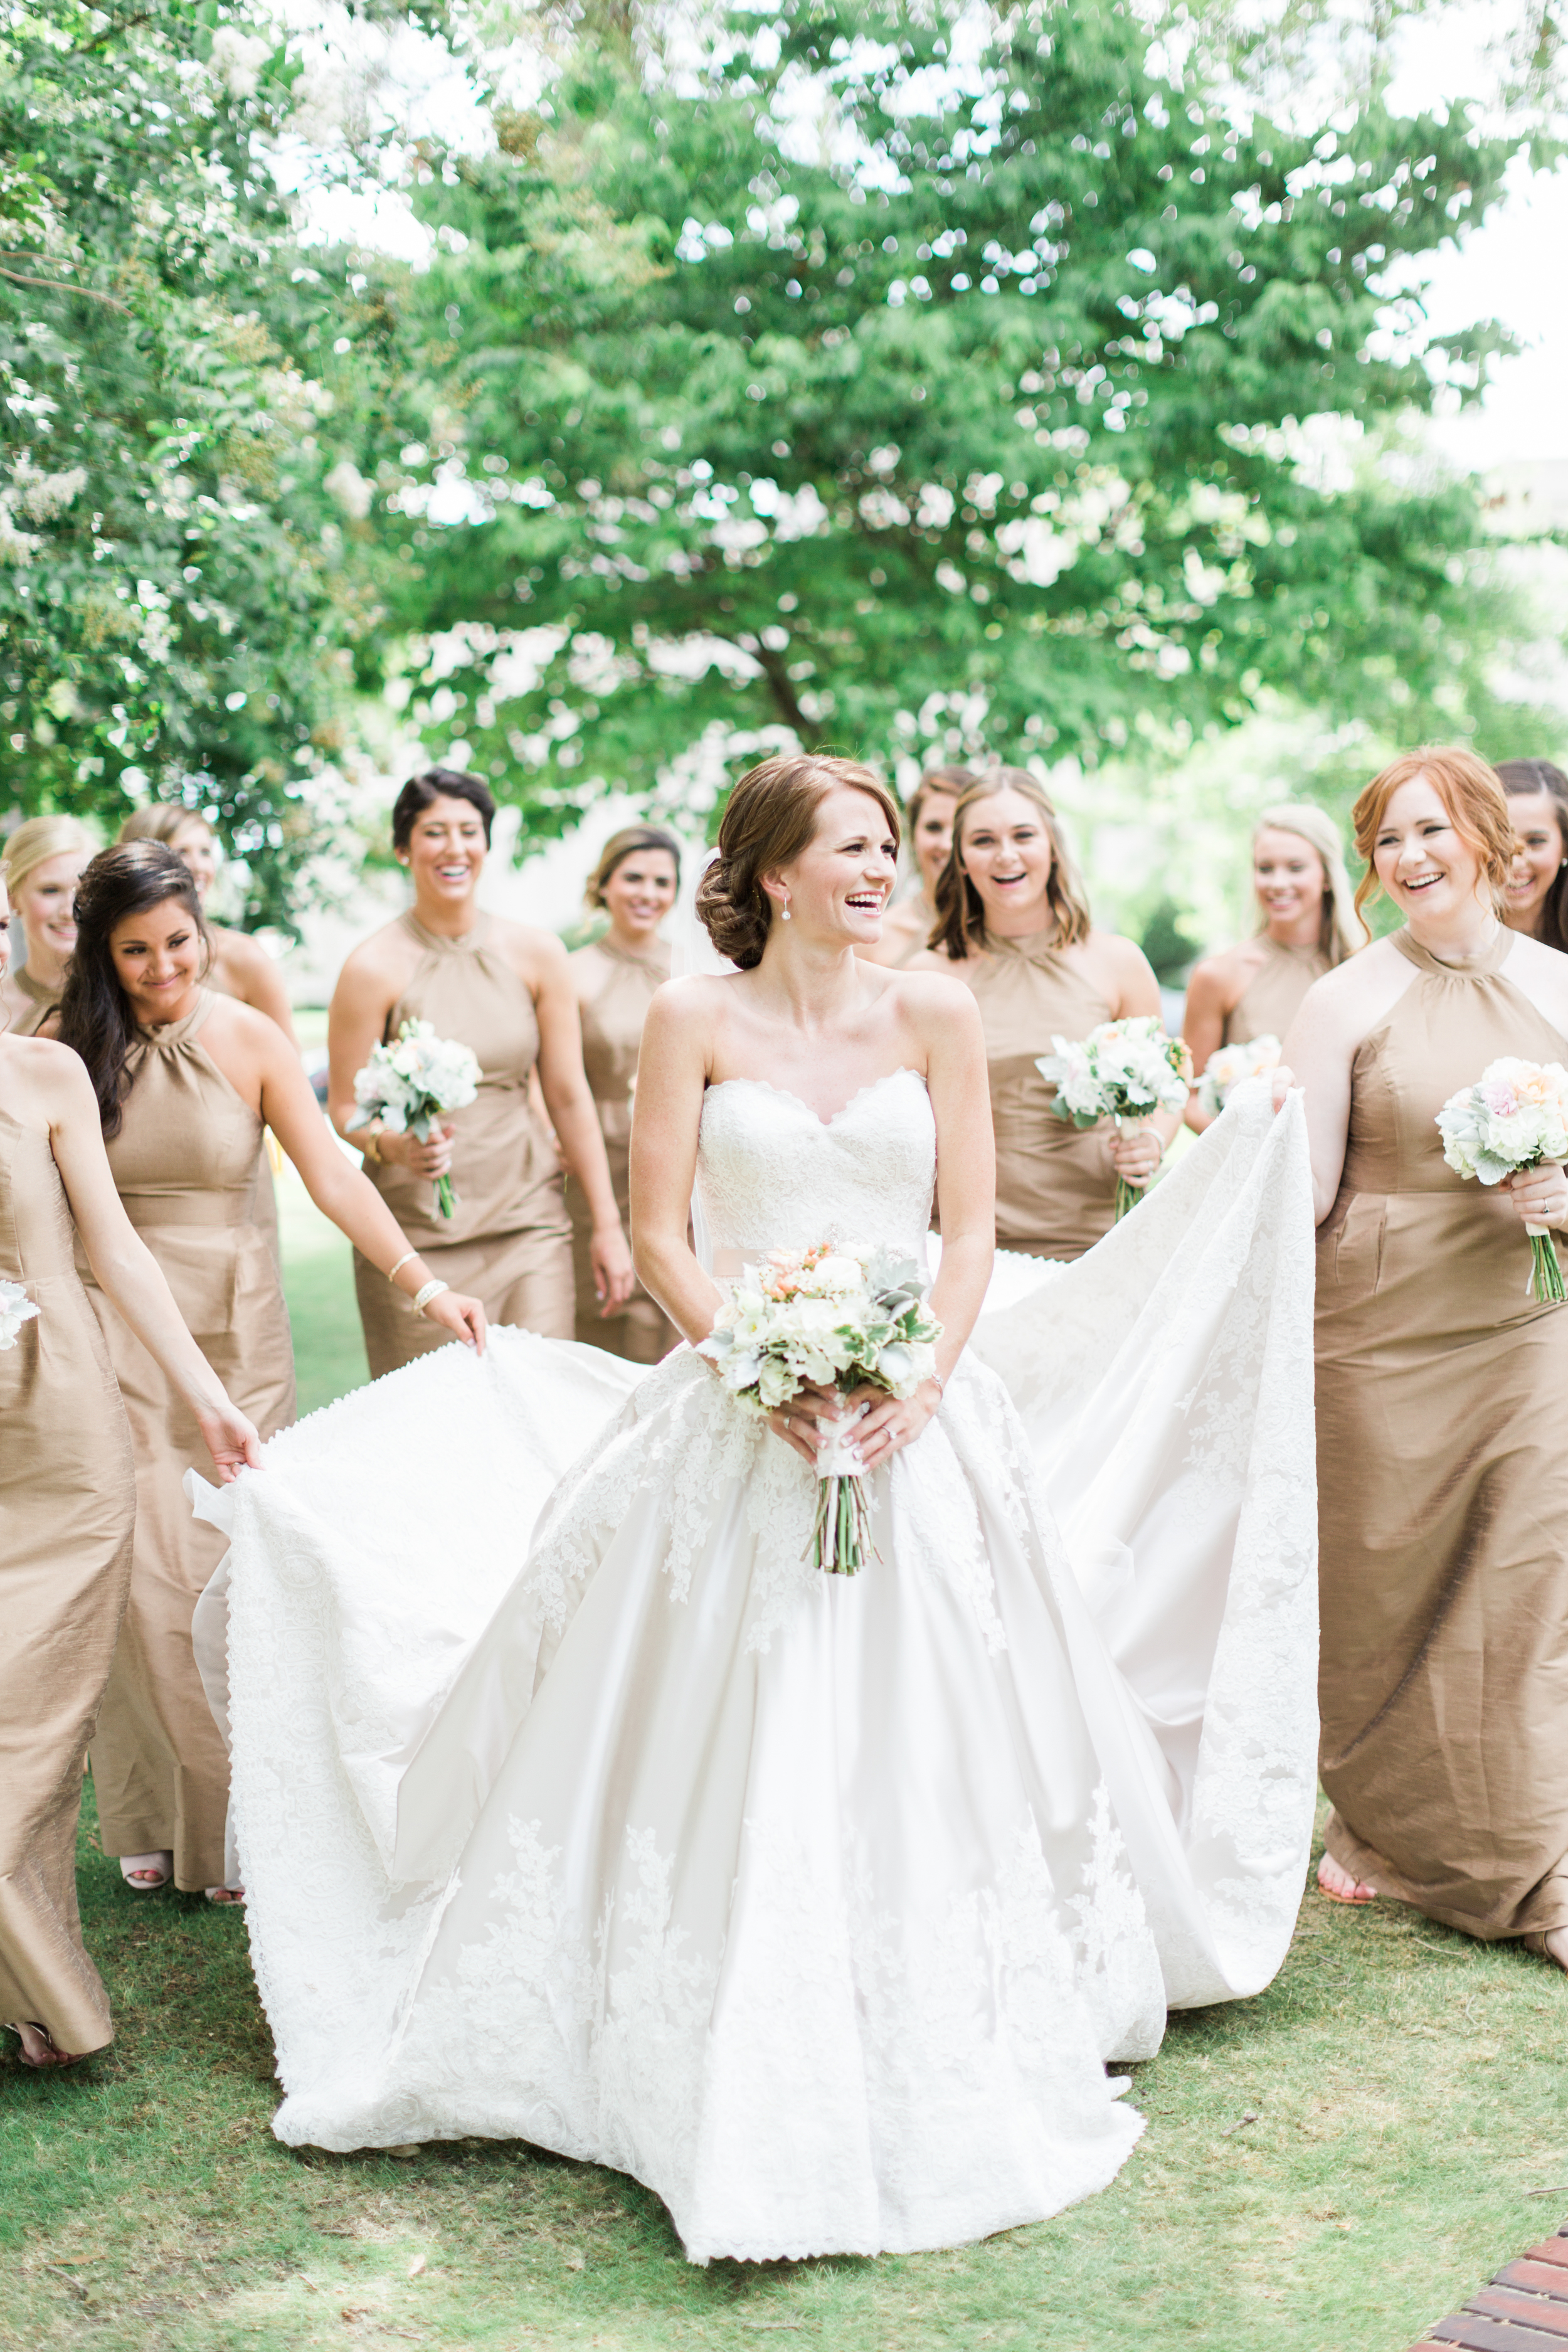 Brewbaker-Wedding-Montgomery-Alabama-Nick-Drollette-111.jpg